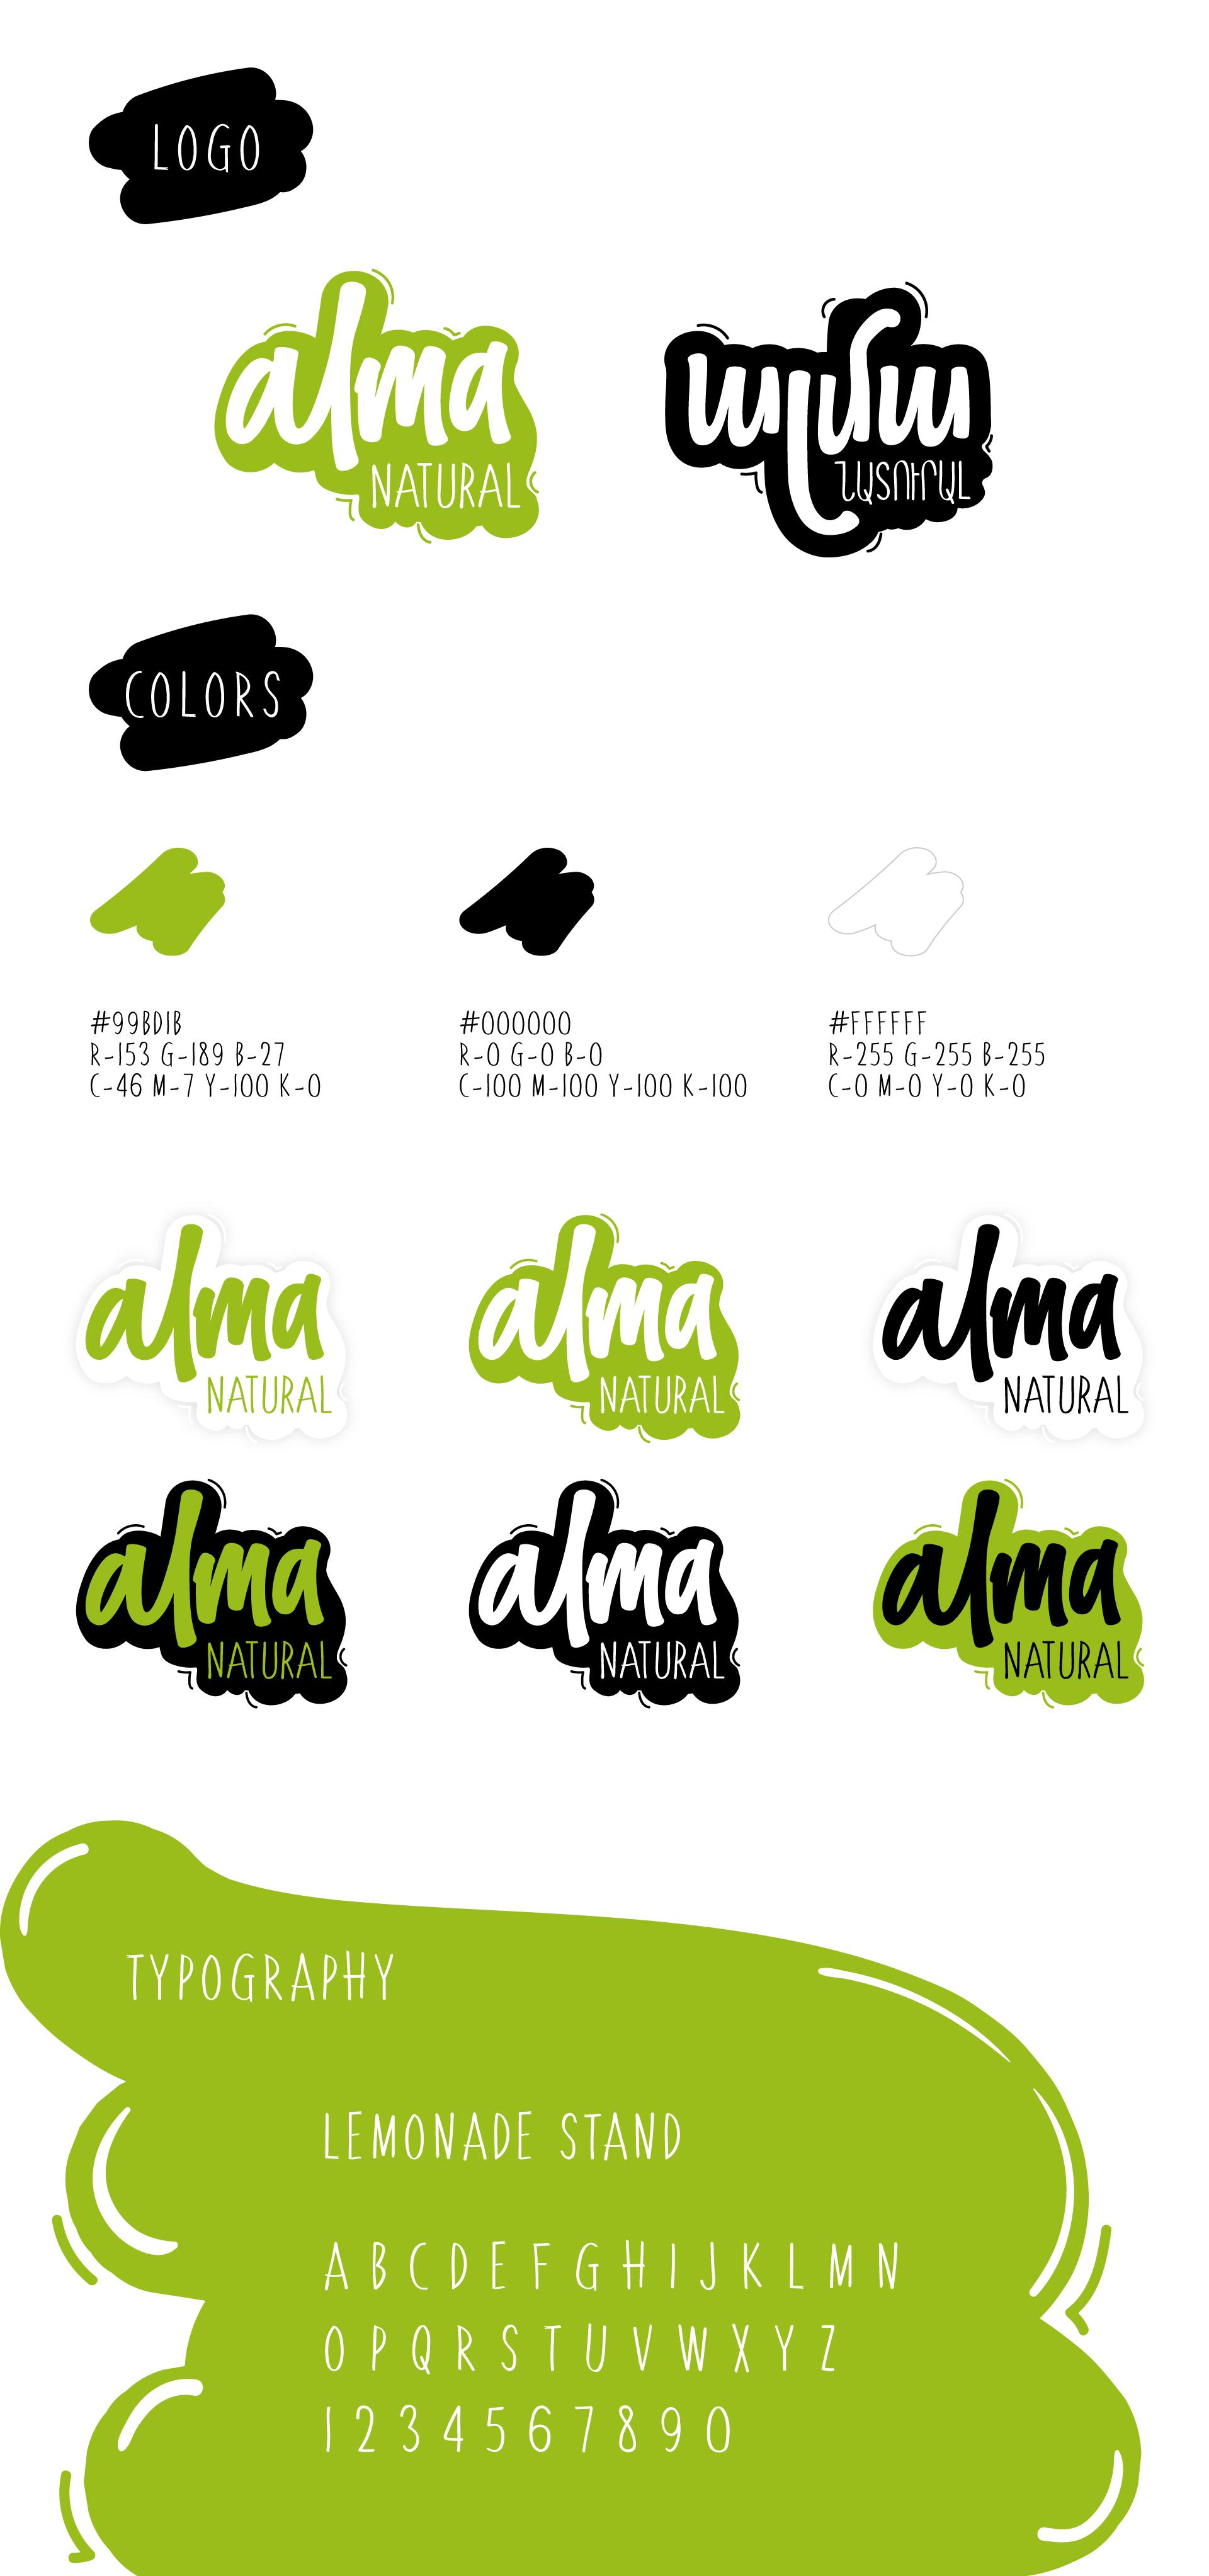 alma branding